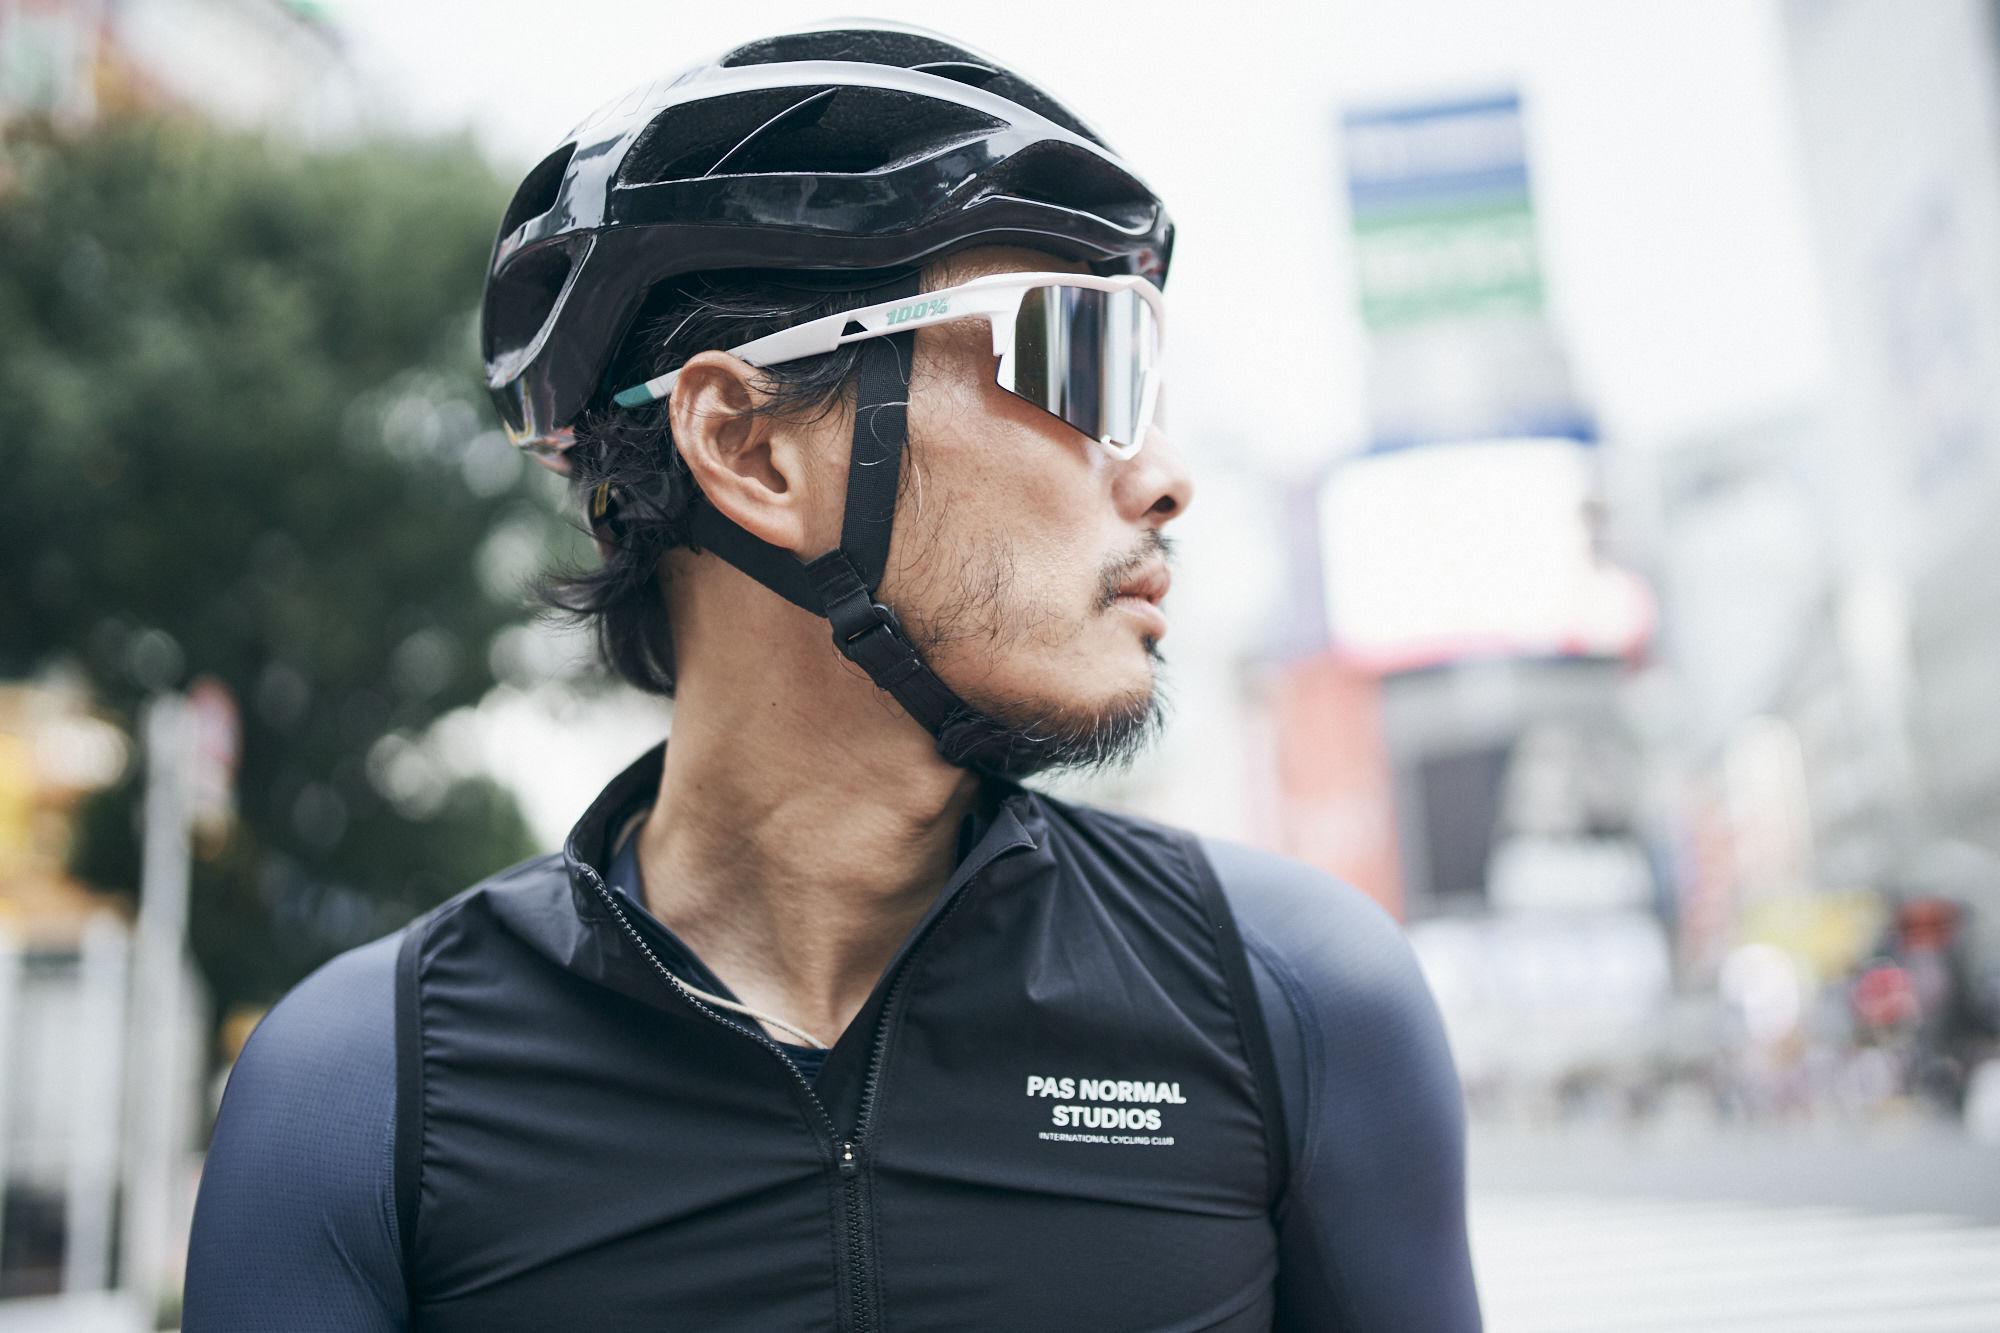 WILDFOX RUNNING: Lars Schneider for Pas Normal in Tokyo